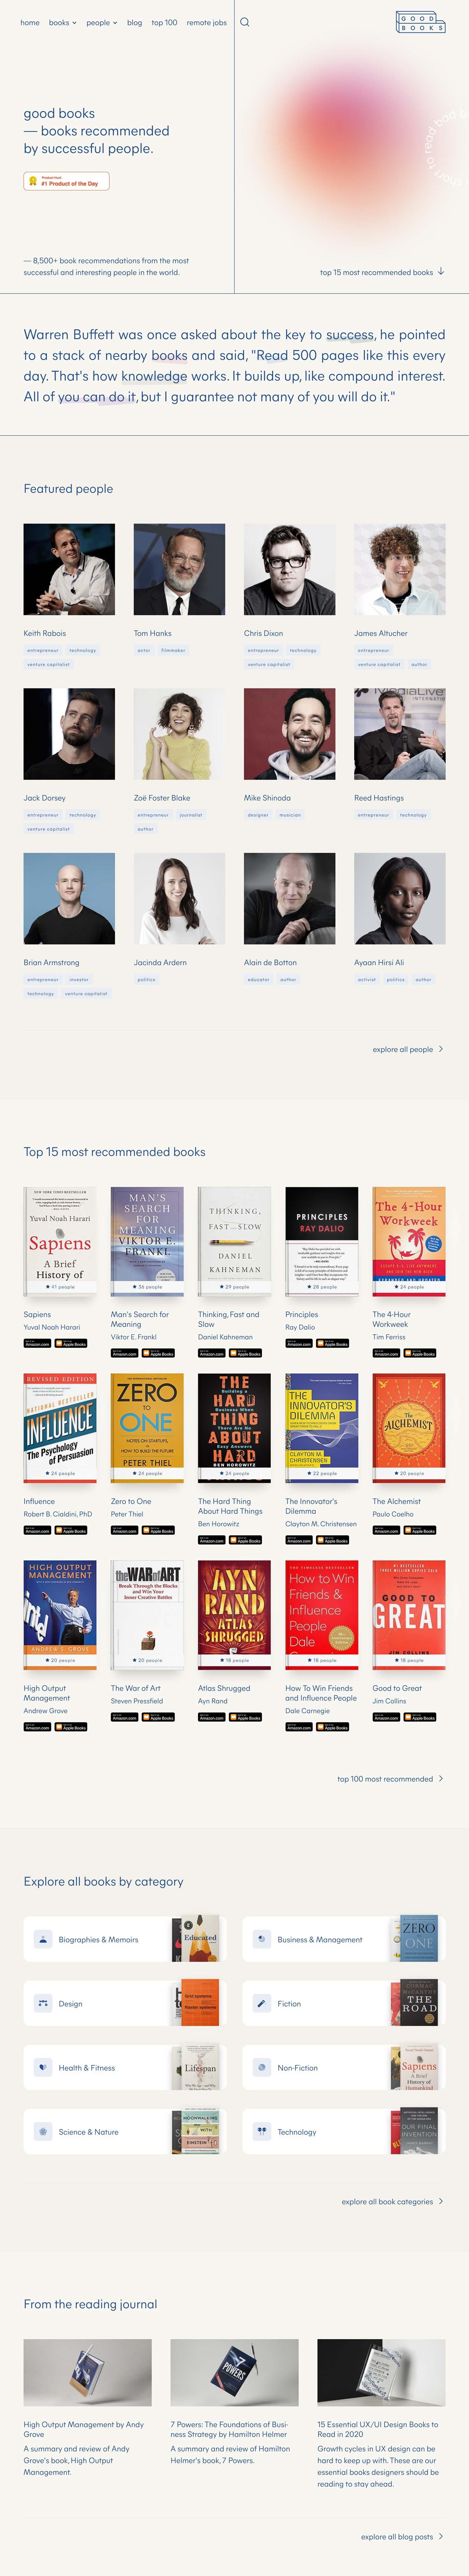 Good Books website - goodbooks.io - Full screenshot